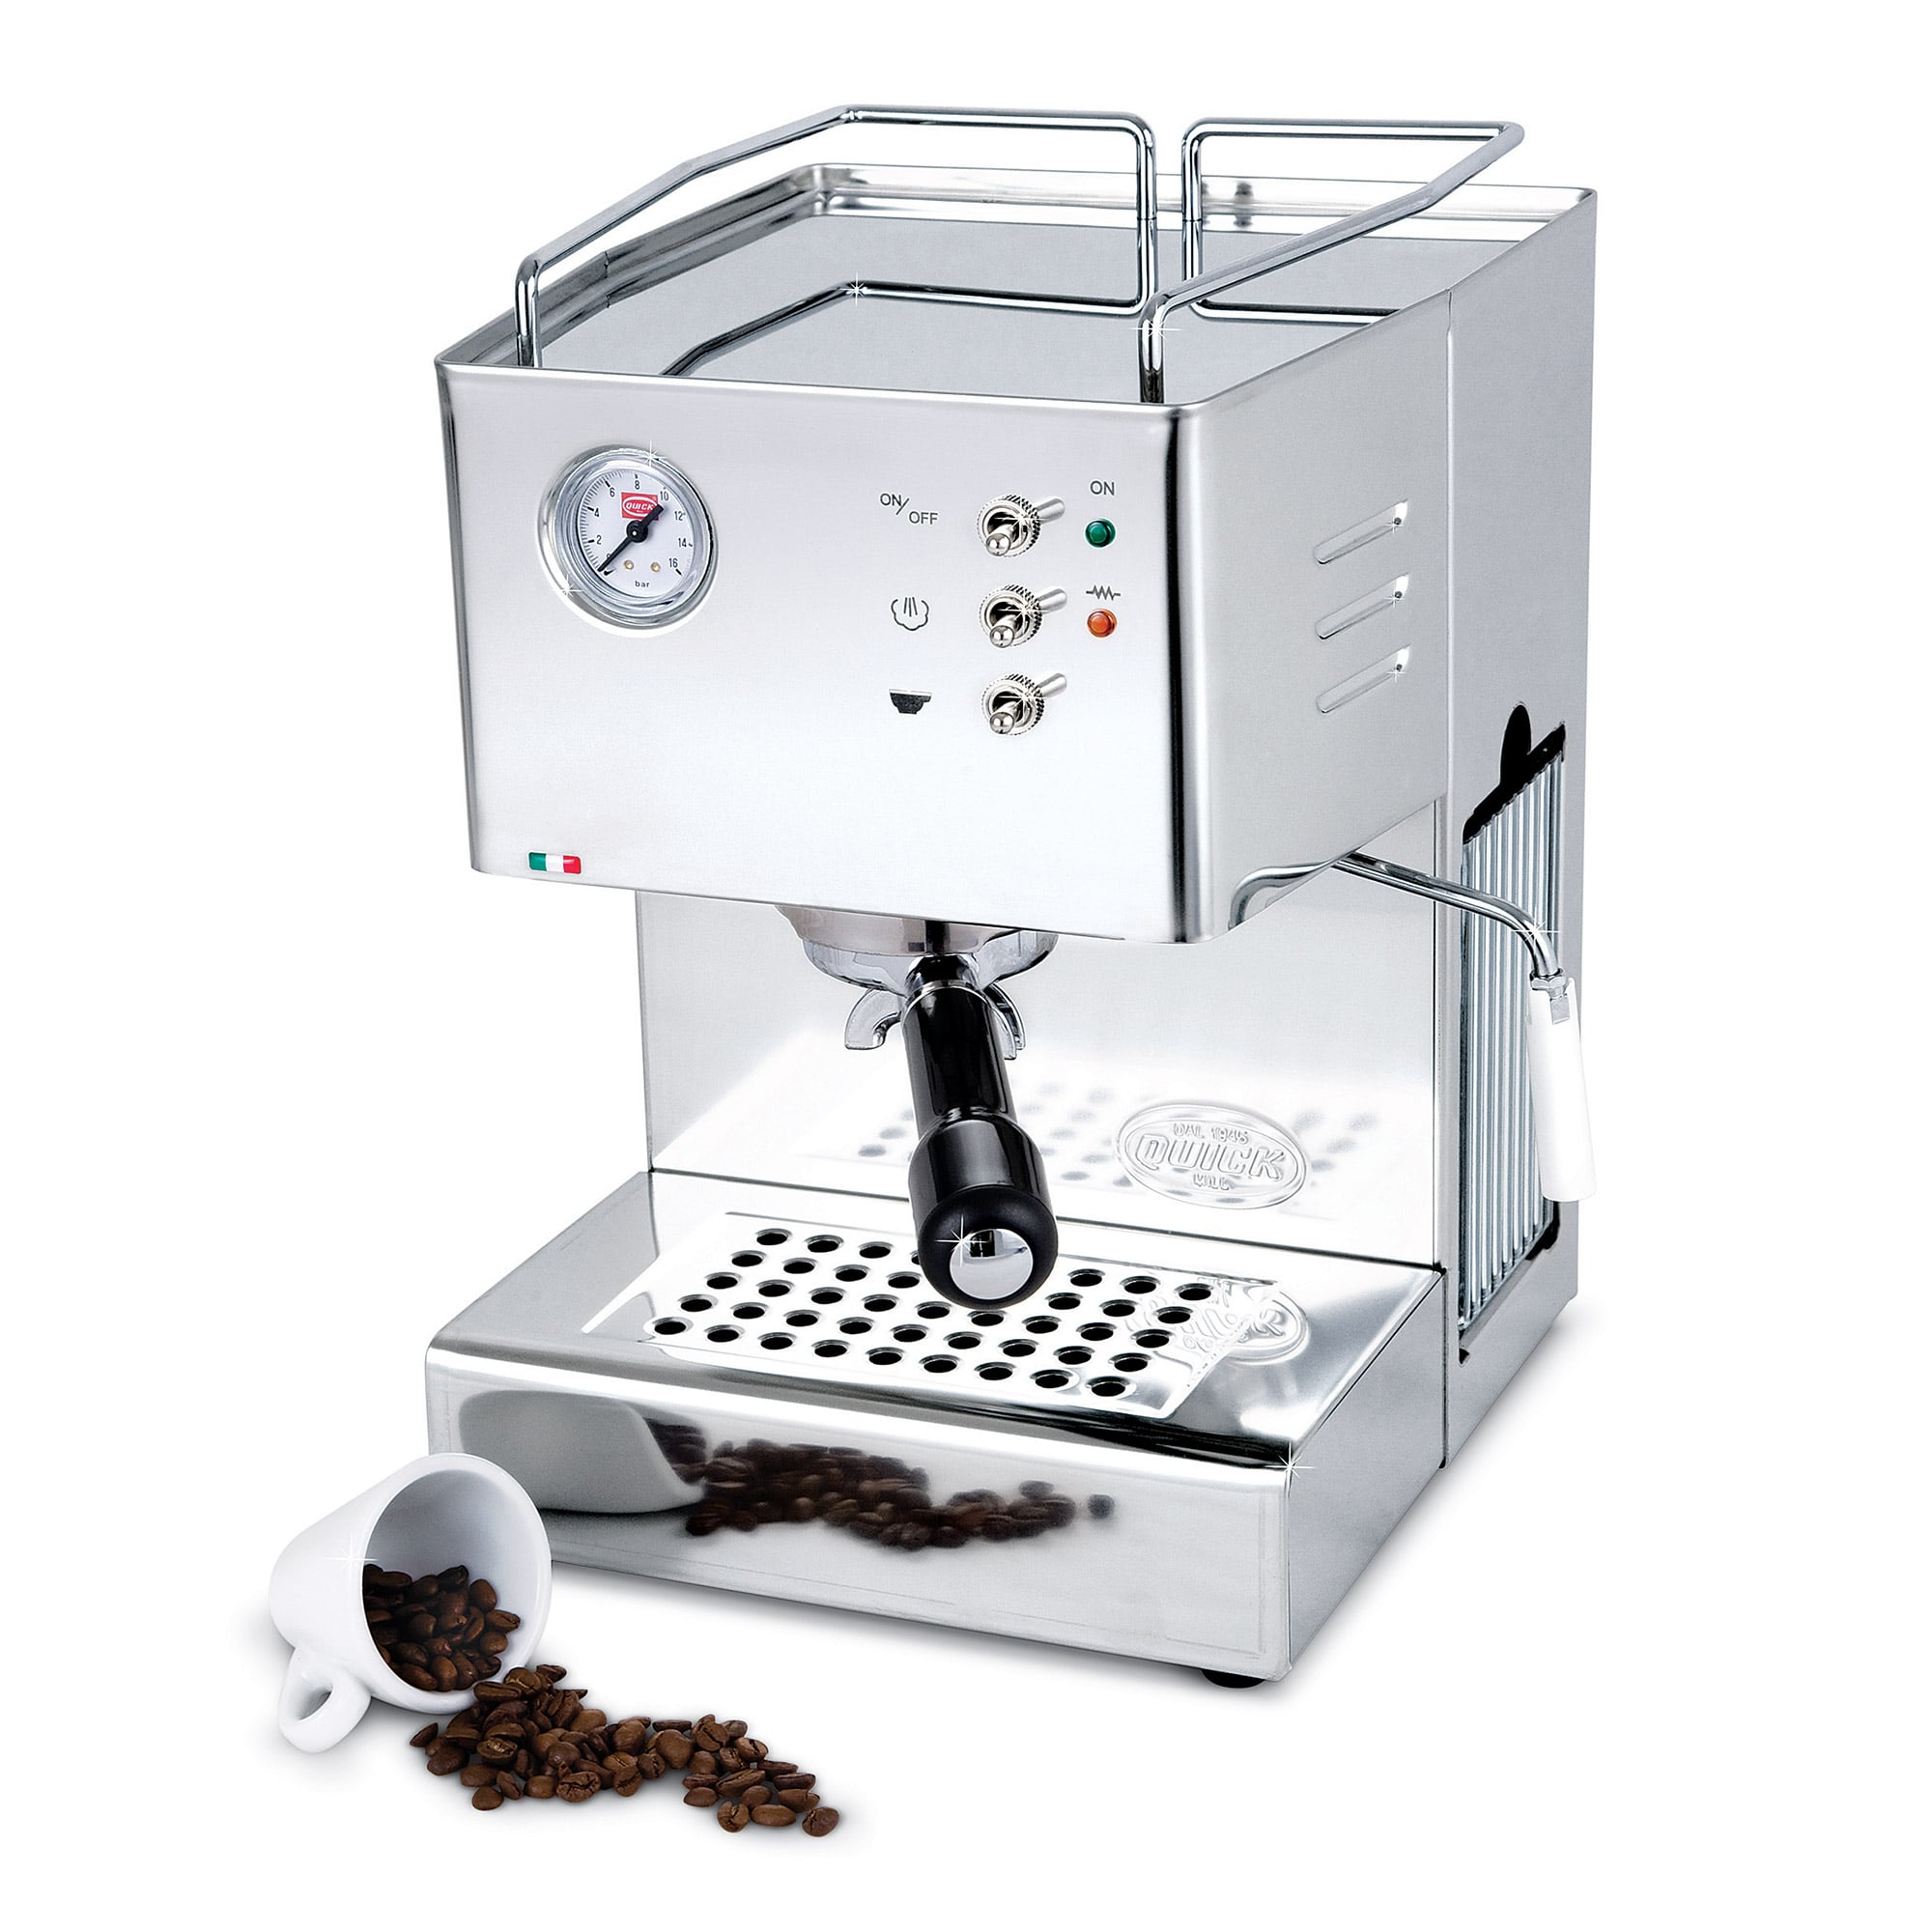 quickmill orione 3000 espressomaschine online kaufen coffee circle. Black Bedroom Furniture Sets. Home Design Ideas